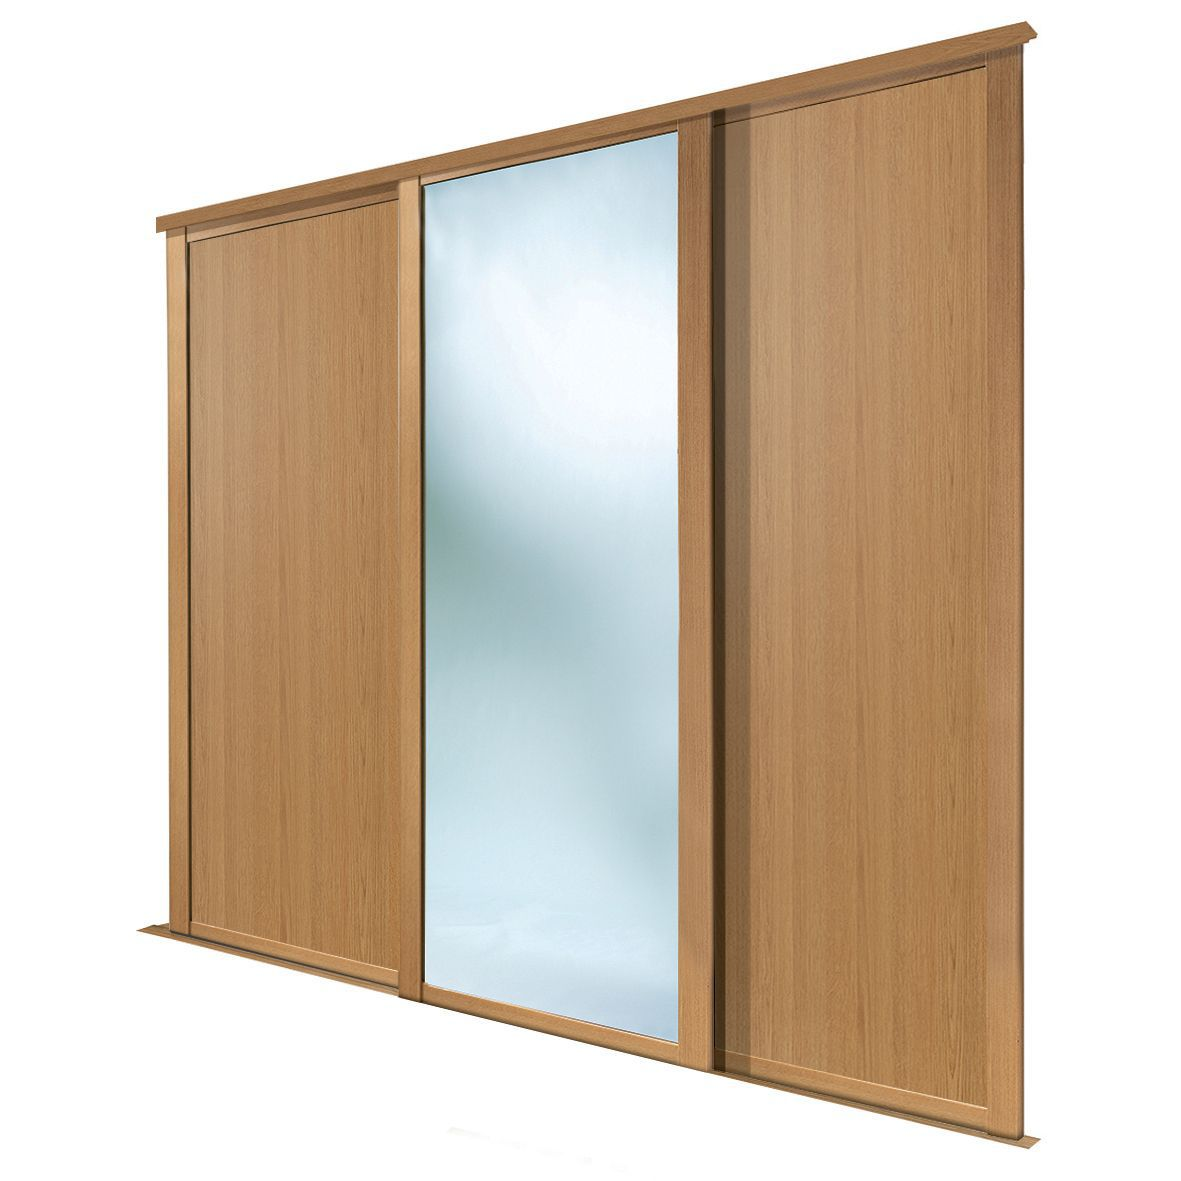 Shaker Full Length Mirror Oak Effect Sliding Wardrobe Door